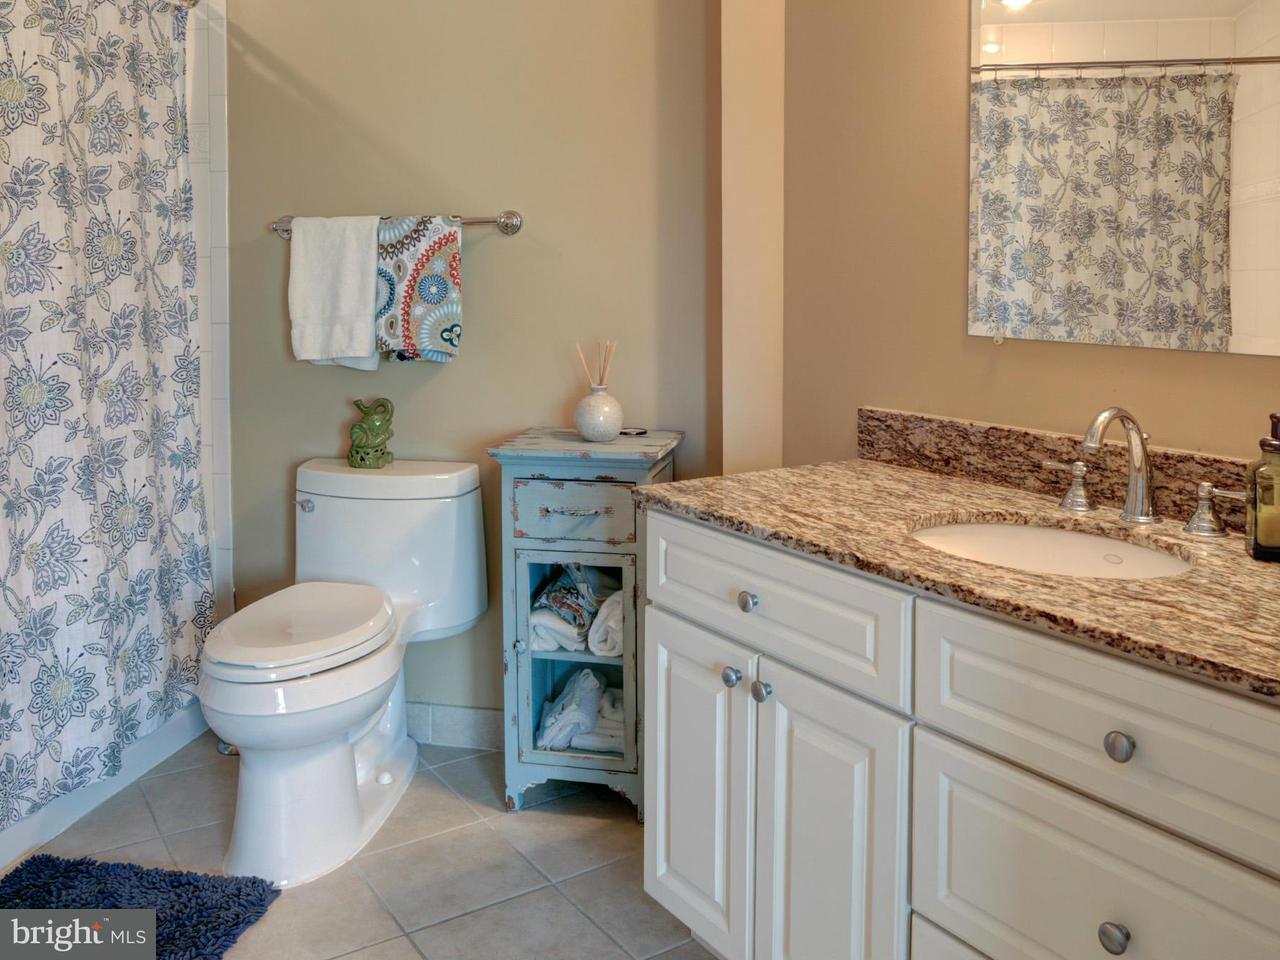 Additional photo for property listing at 5 PARK PL #414 5 PARK PL #414 Annapolis, Мэриленд 21401 Соединенные Штаты